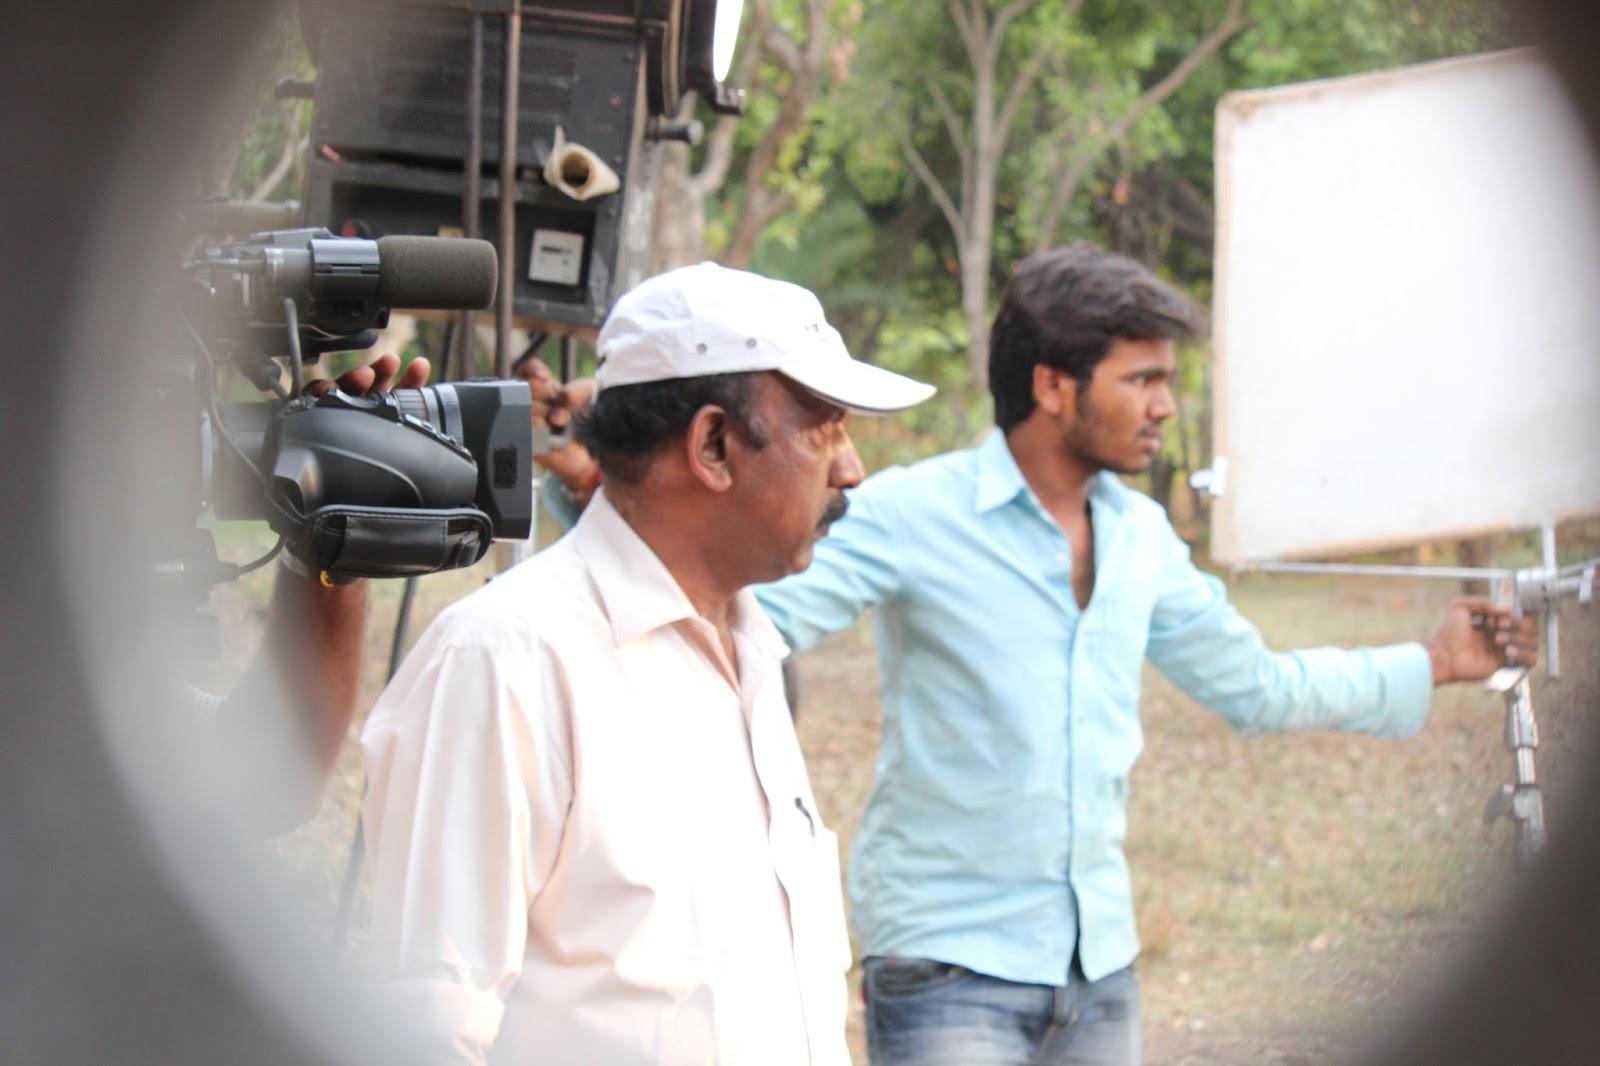 Mahabharatam tamil episode 70 / Schulmans movie bowl grille